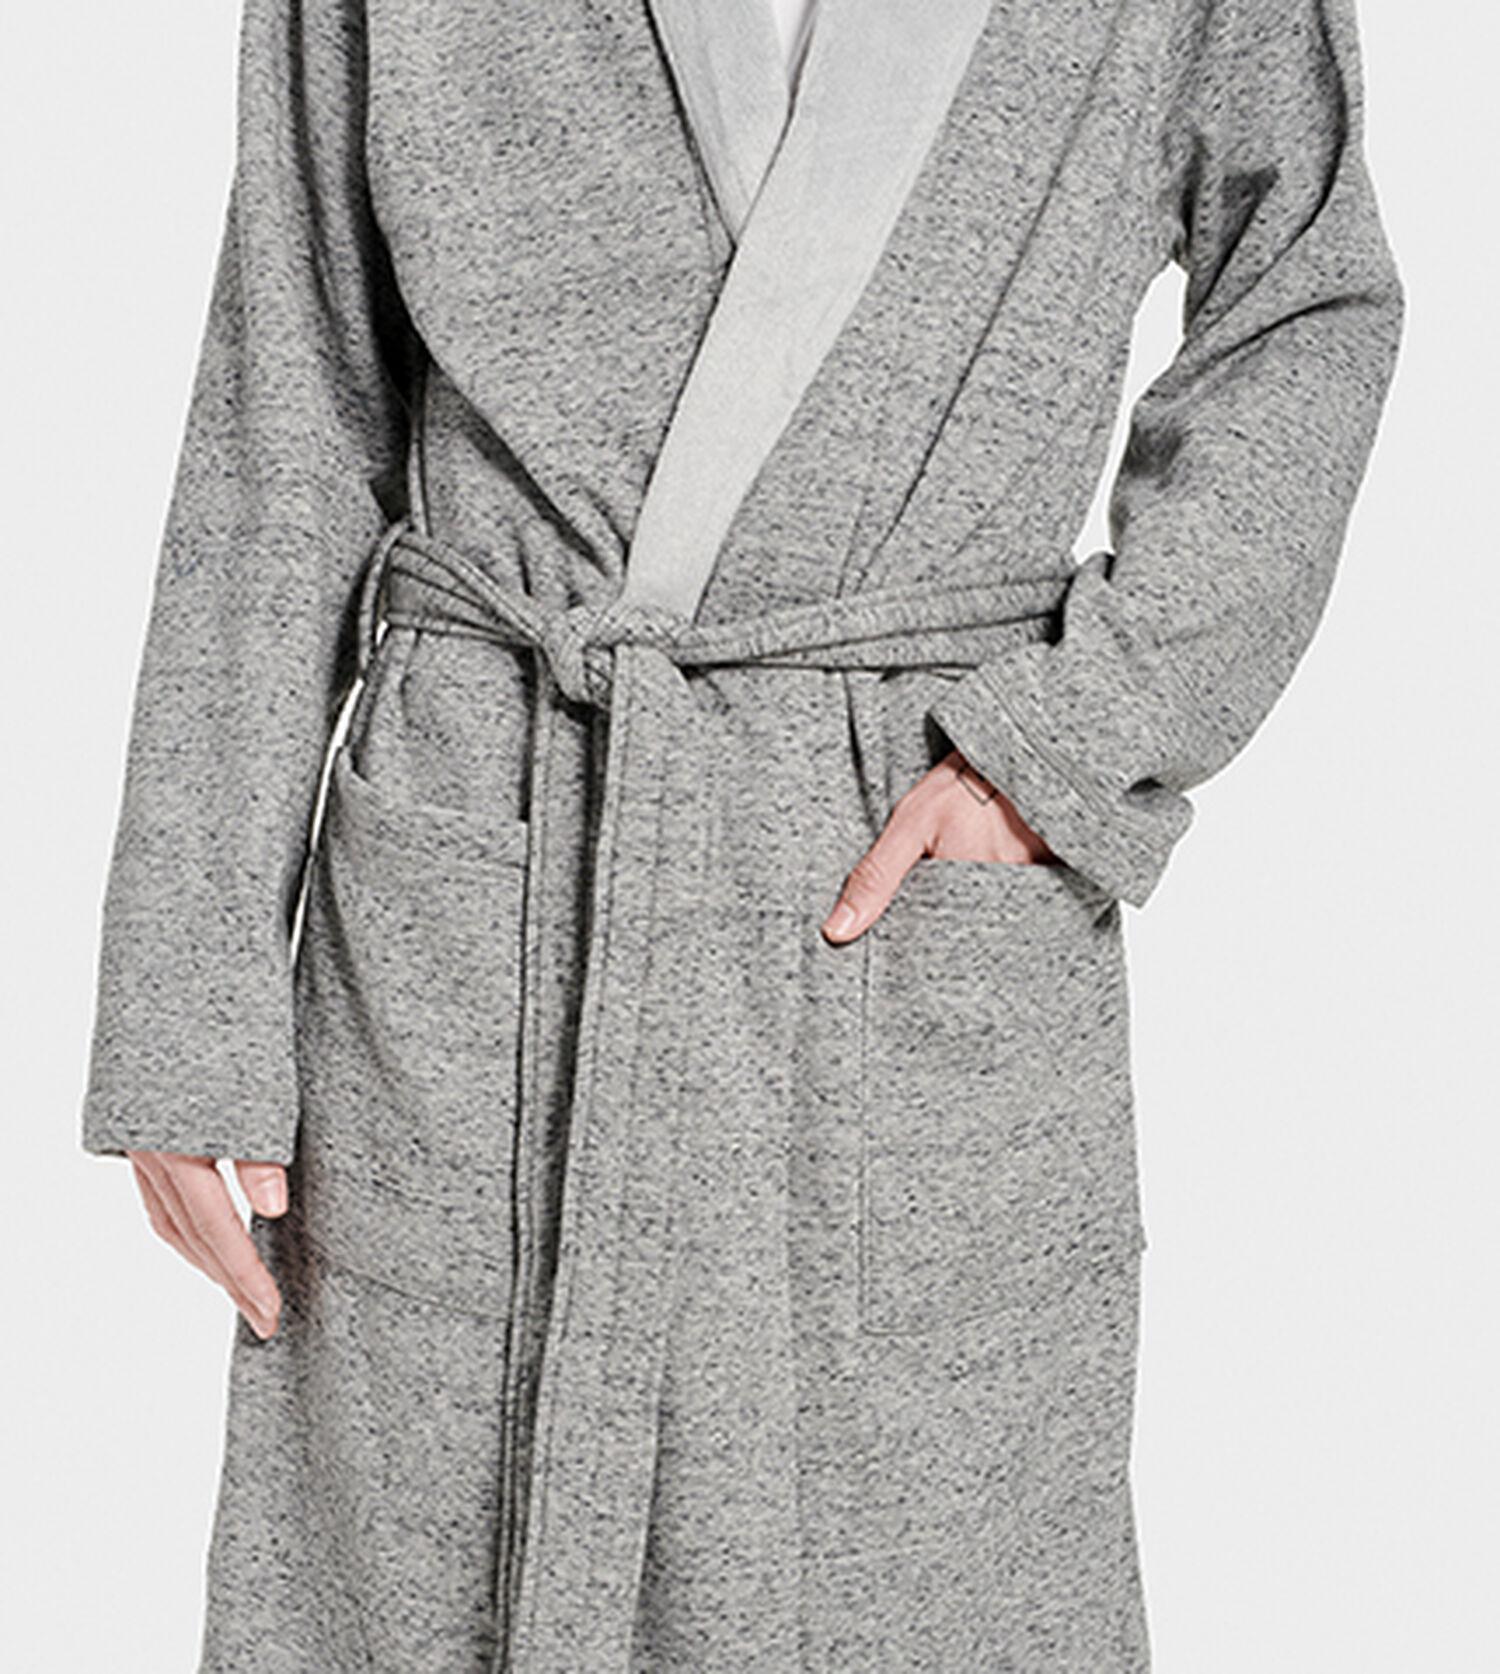 03283bc038 Zoom Robinson Robe - Image 5 of 5